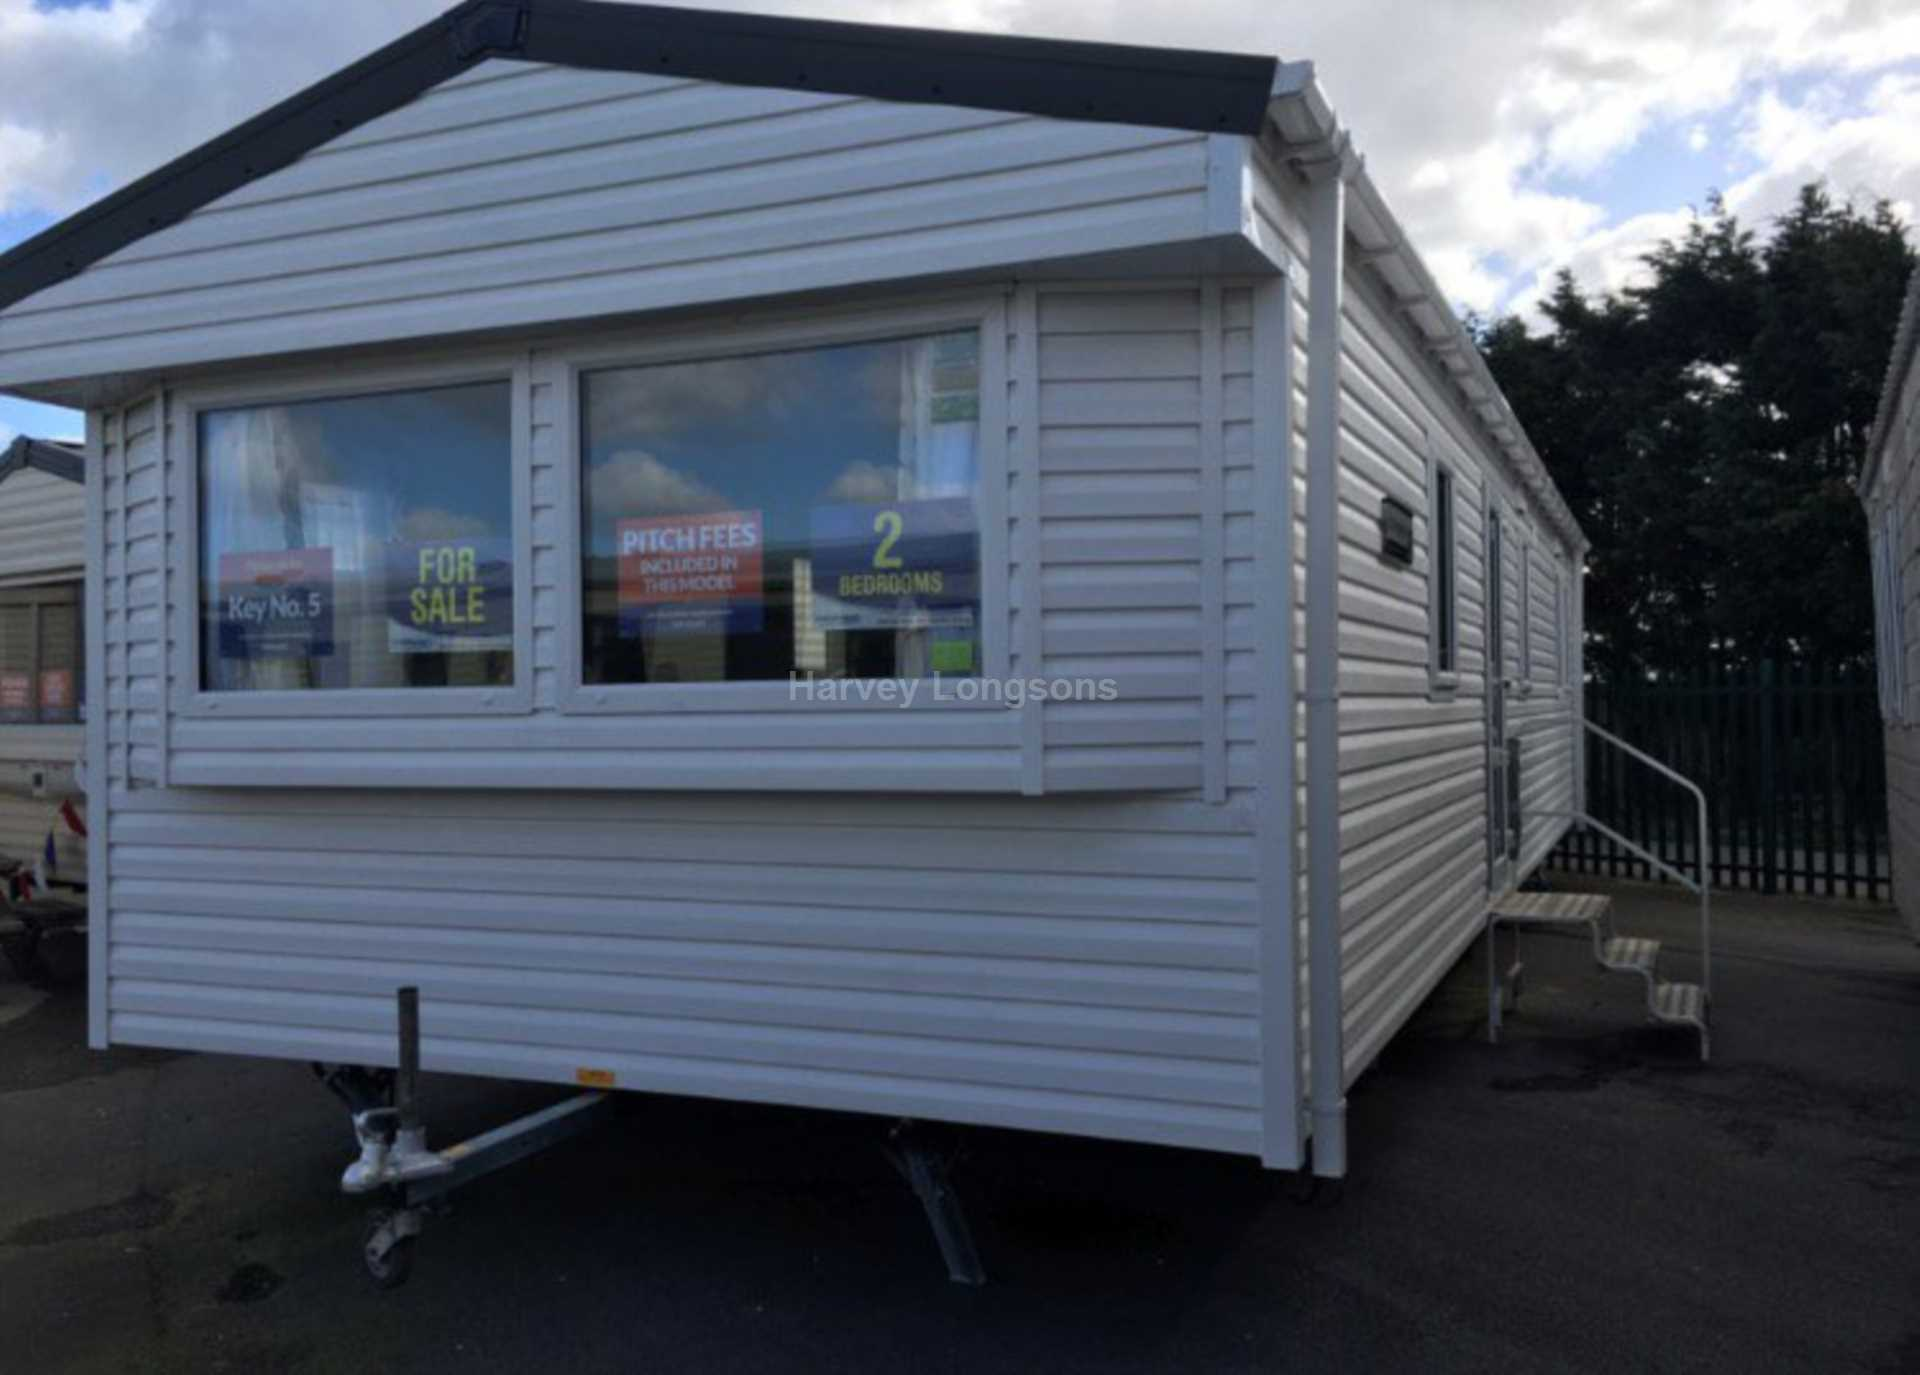 Lastest Static Caravans For Sale Alberta Whitstable Kent  Park Holidays UK